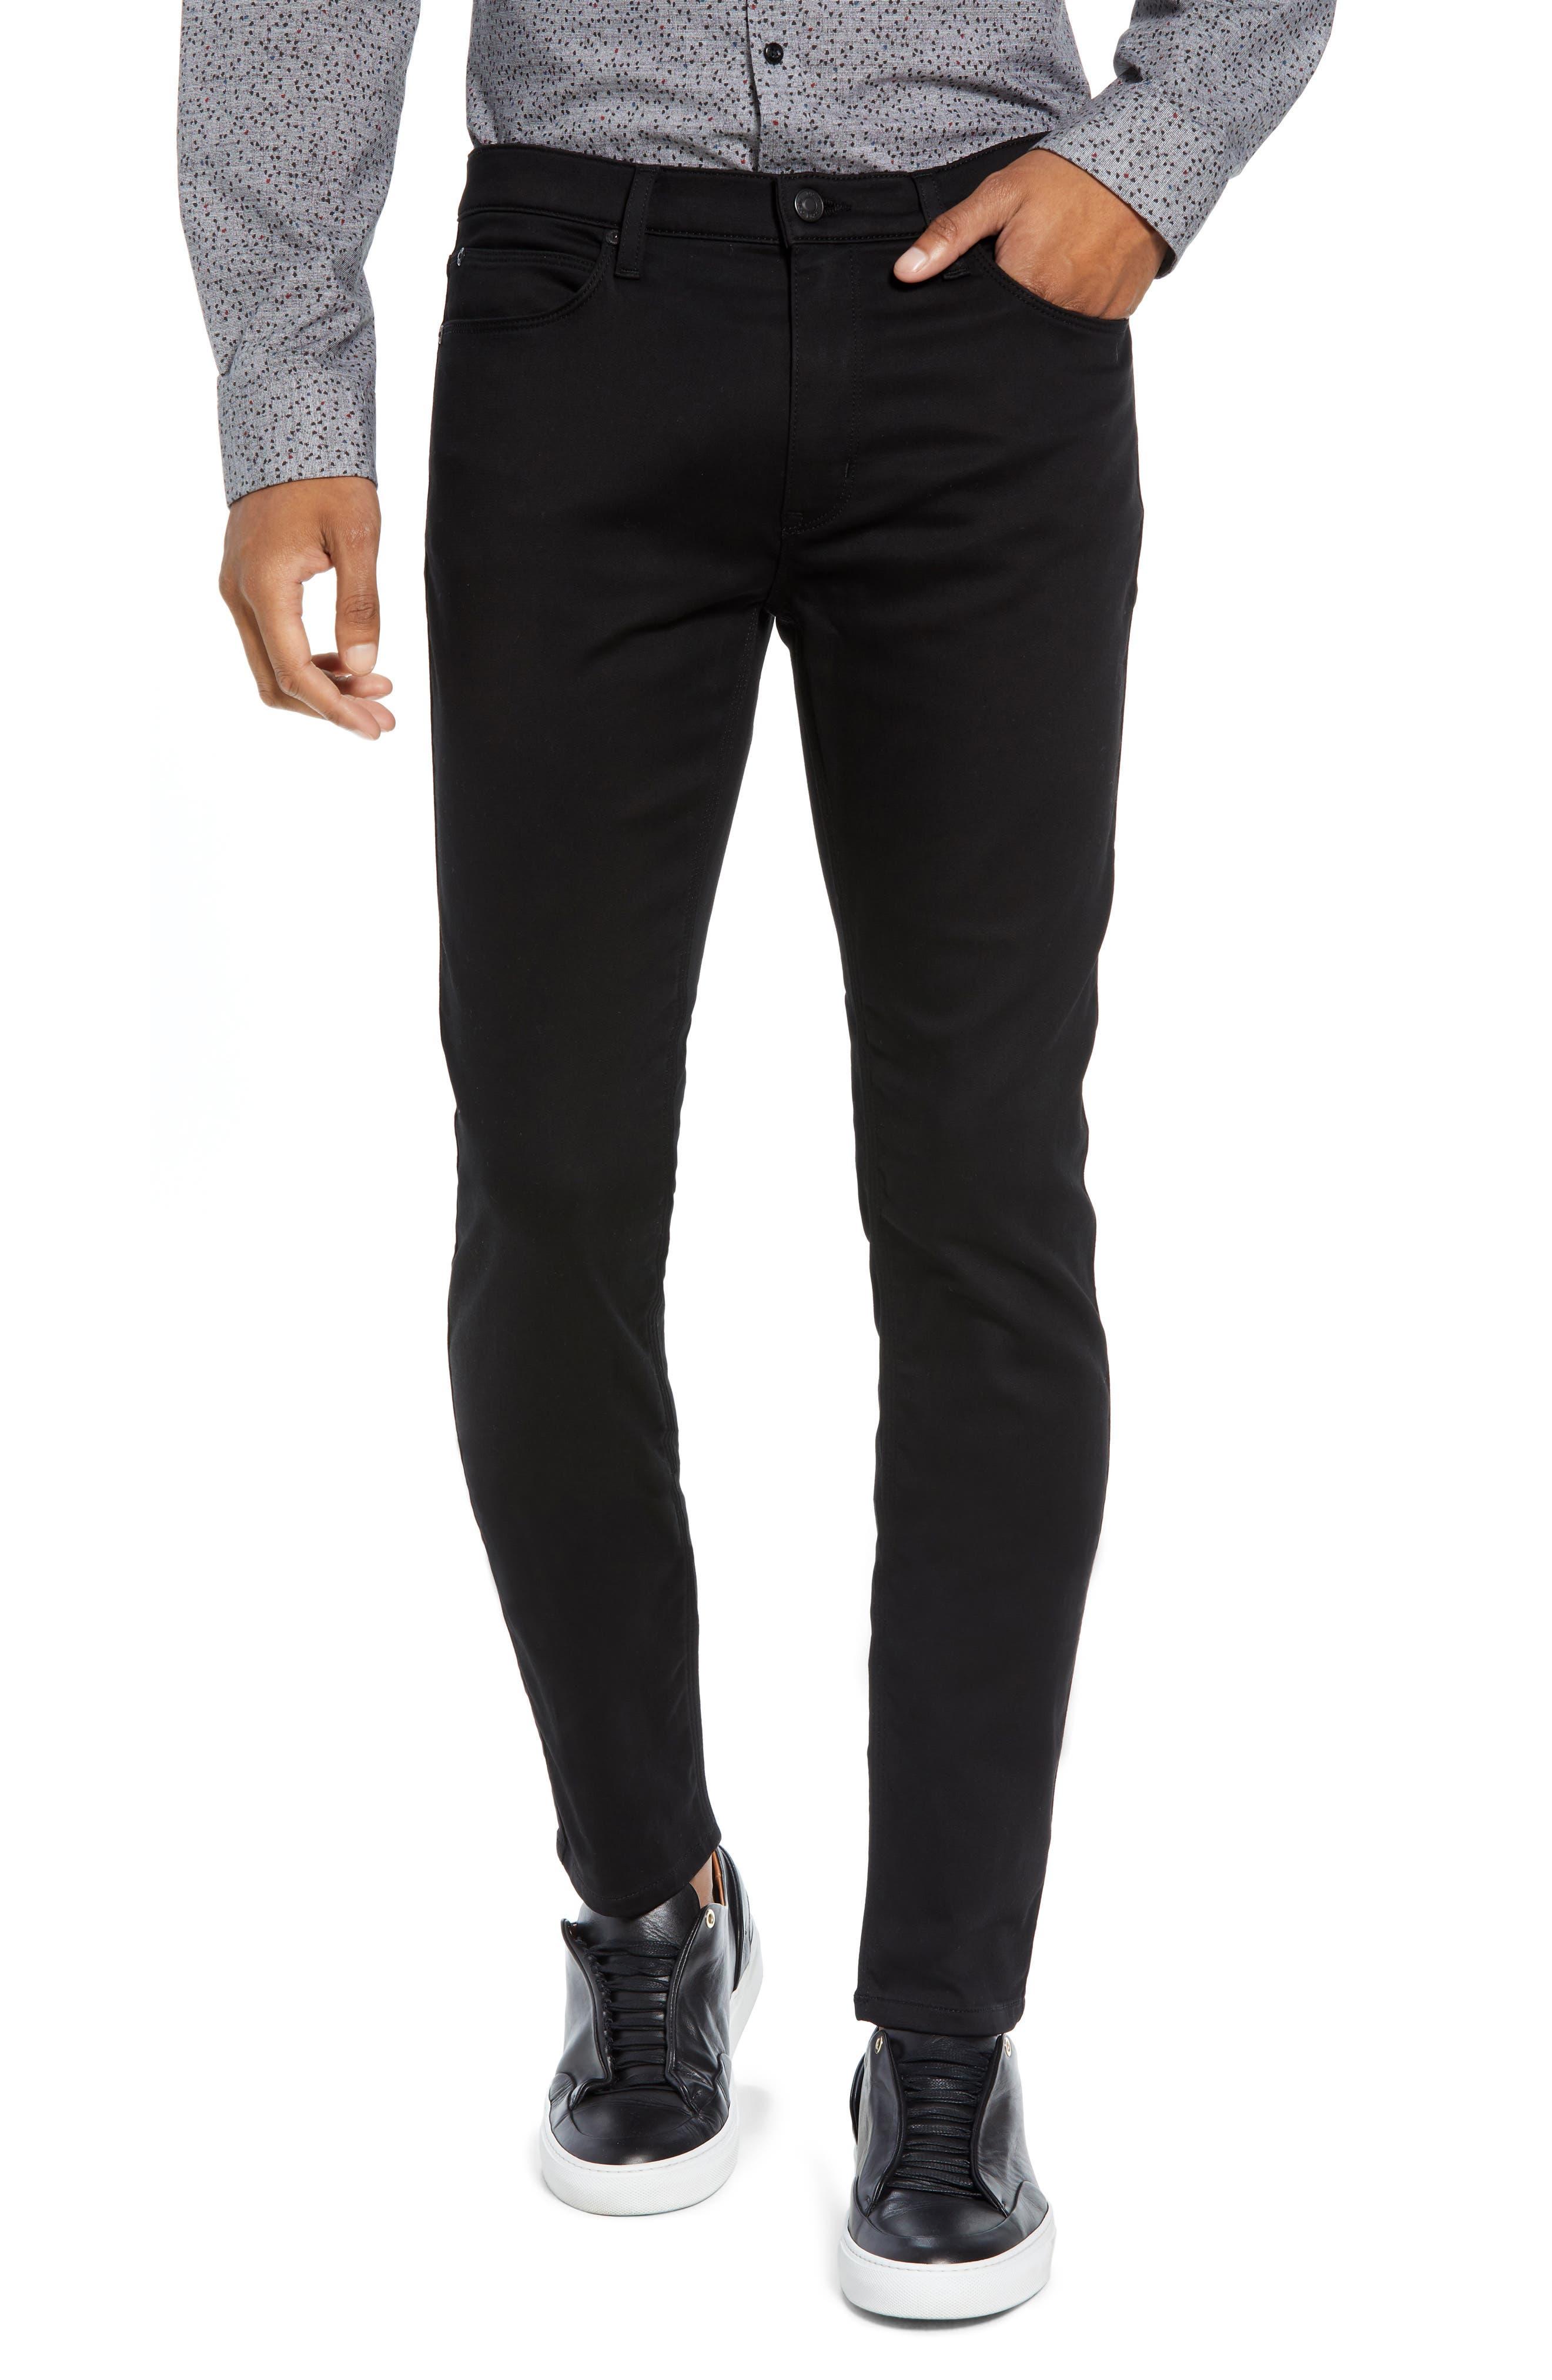 734 Skinny Fit Jeans,                             Main thumbnail 1, color,                             BLACK